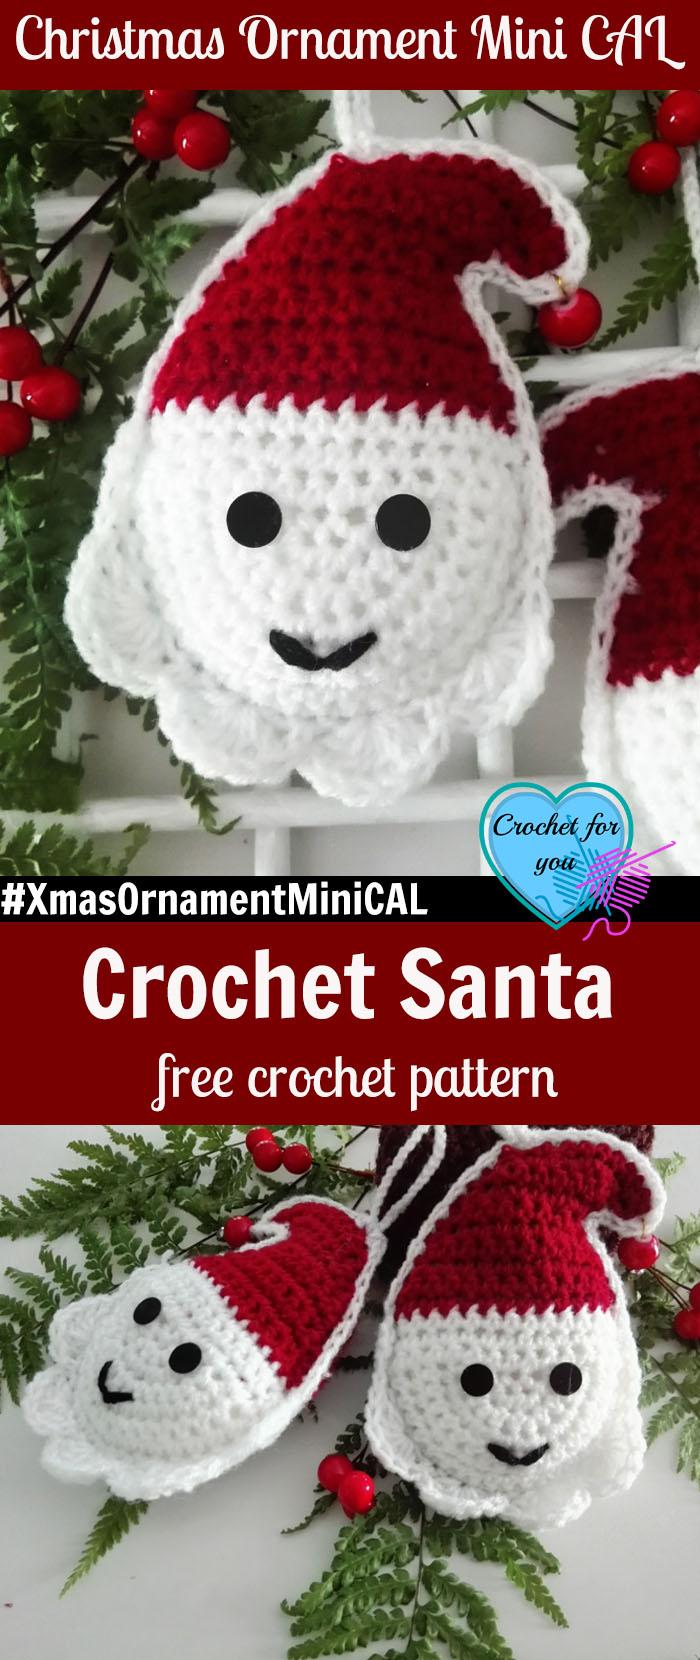 Christmas Ornament Mini Cal Crochet Santa 88 Crochet For You